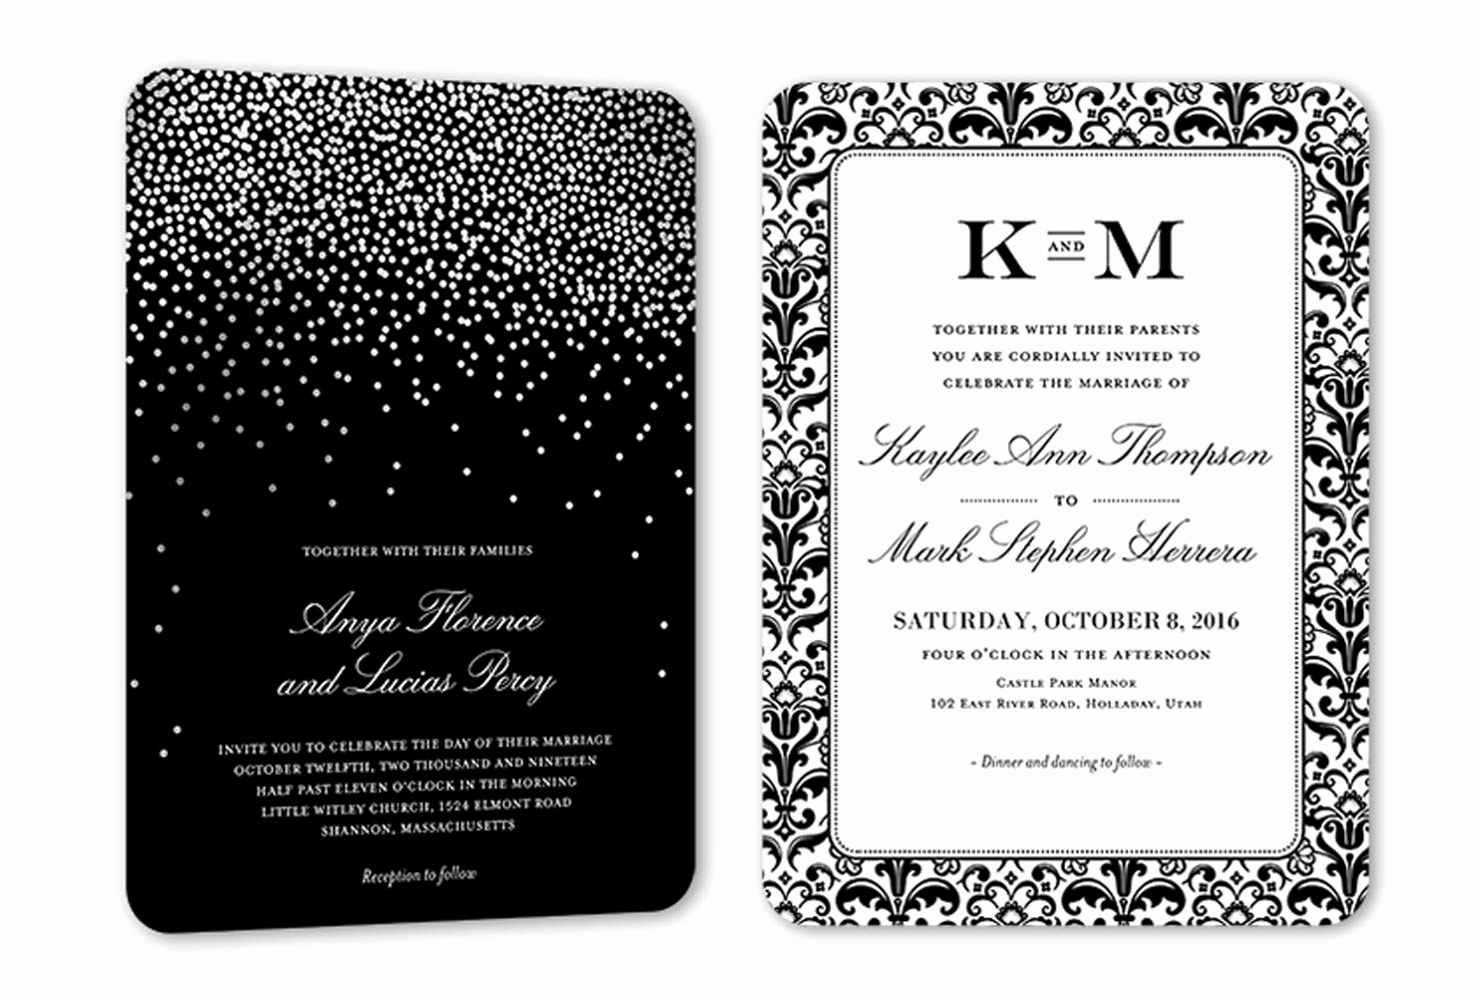 Formal Birthday Invitation Wording Lovely 35 Wedding Invitation Wording Examples 2019